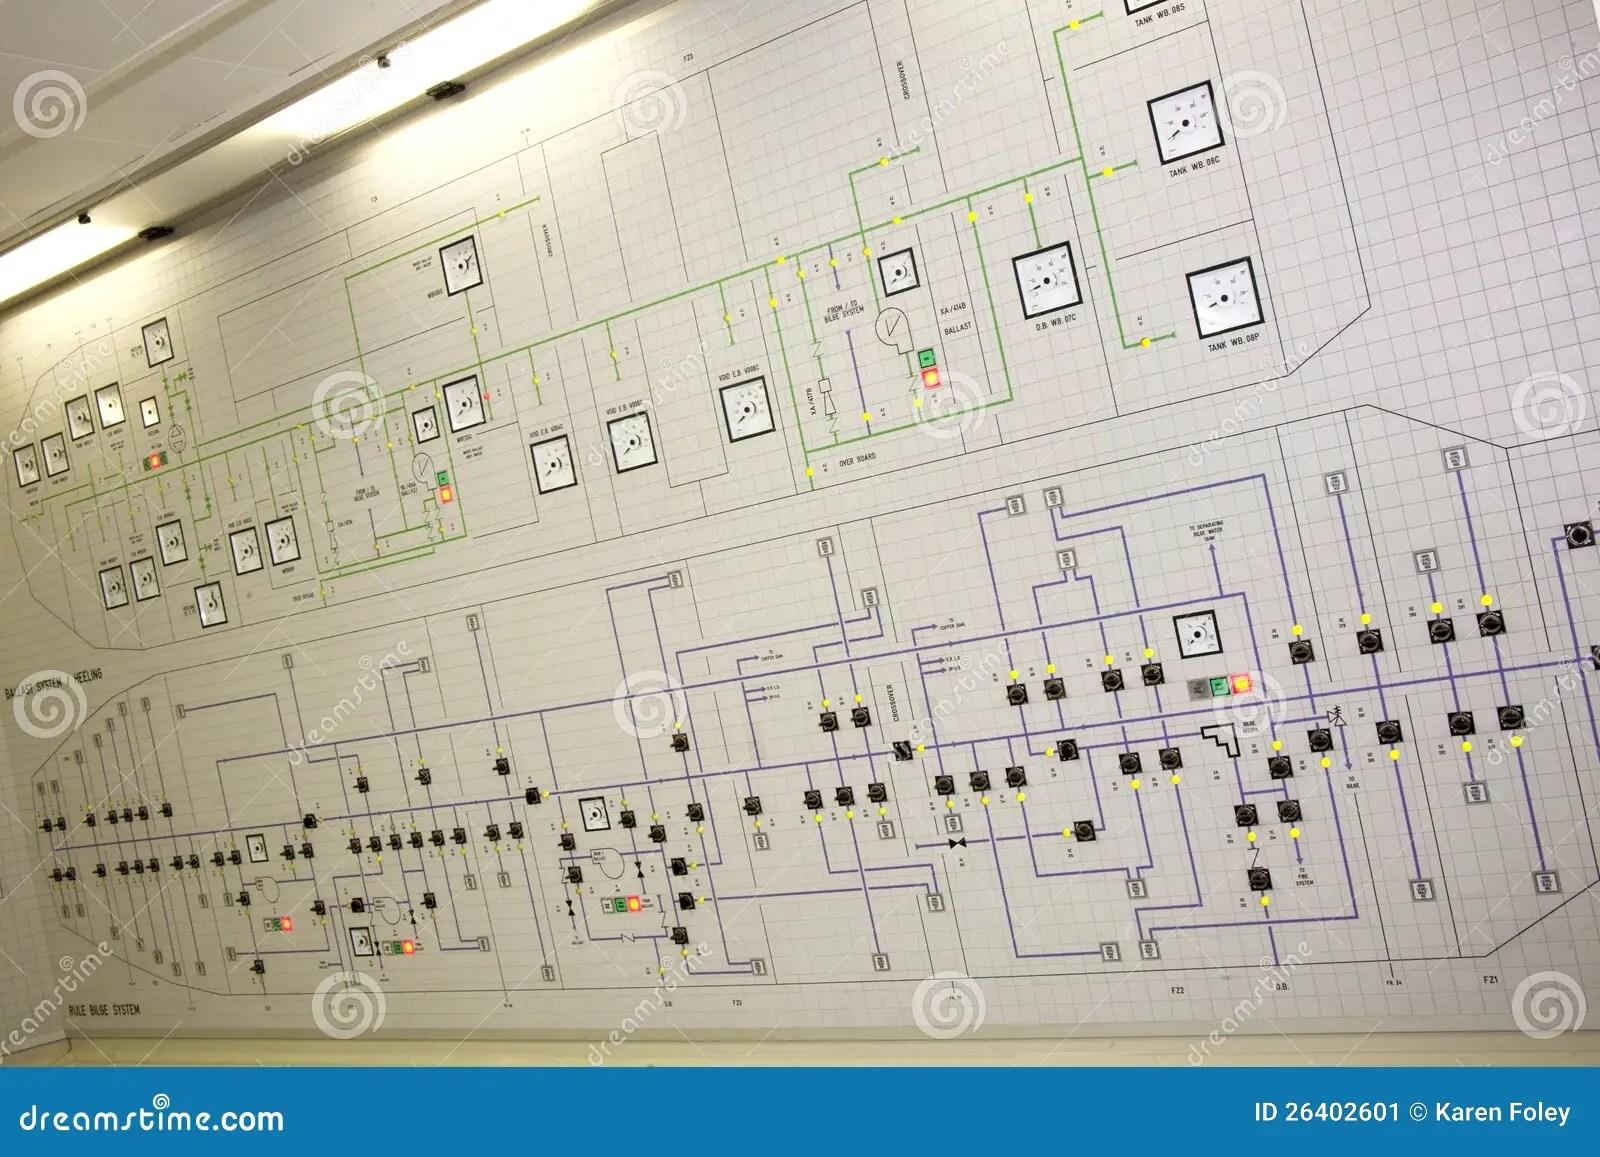 cruise ship diagram brain inside panel of ships stock image 26402601